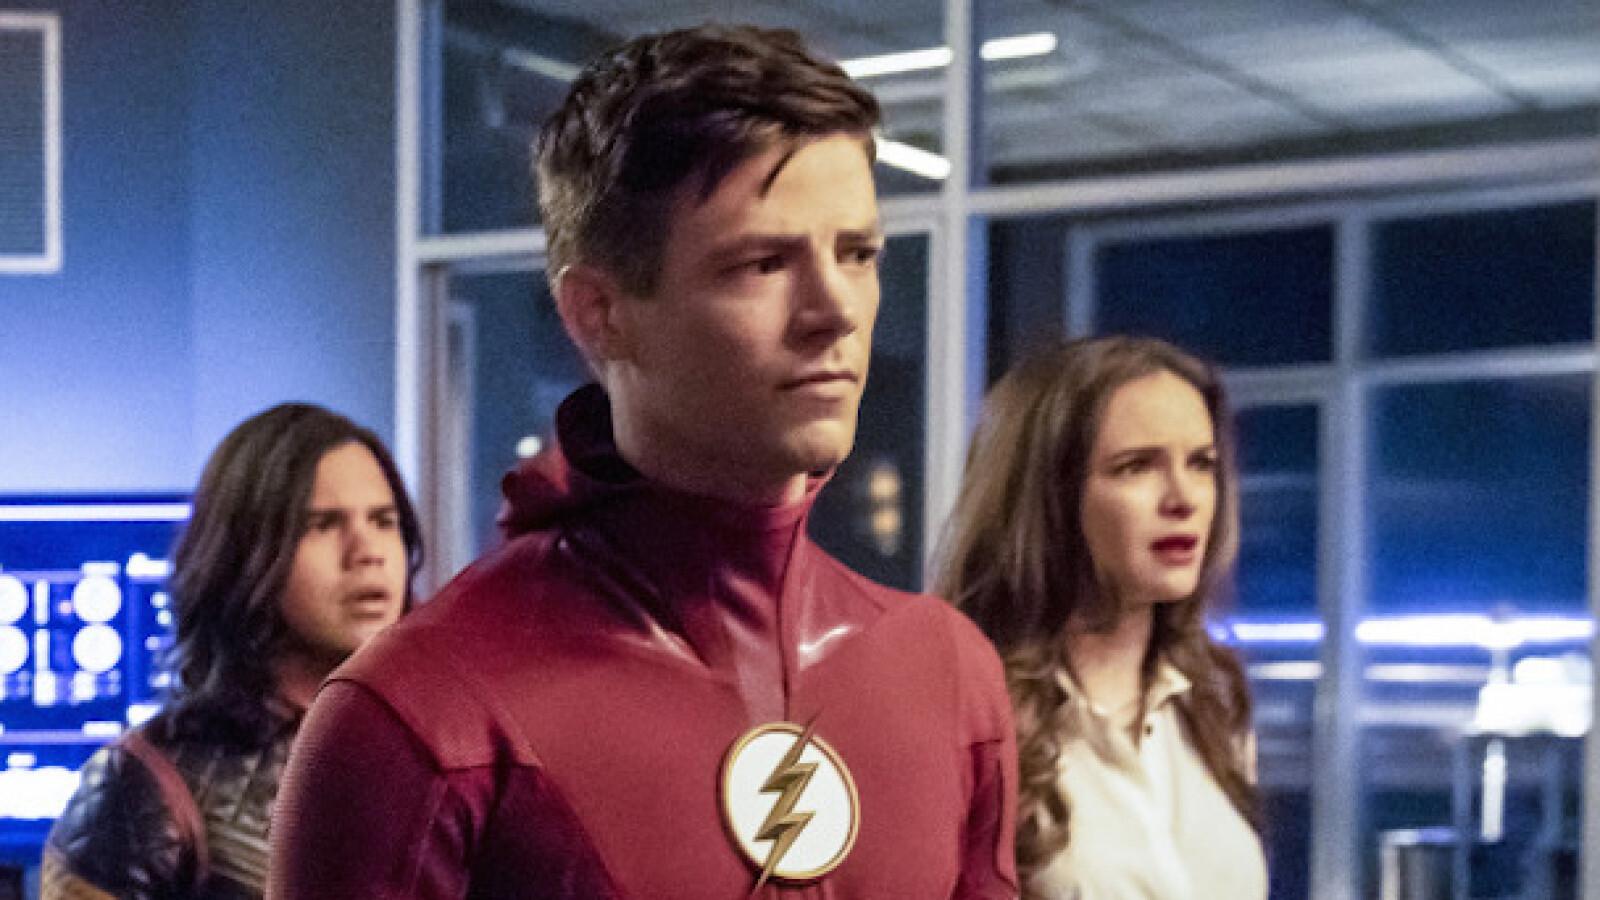 The Flash Staffel 6 Starttermin Bekannt Netzwelt